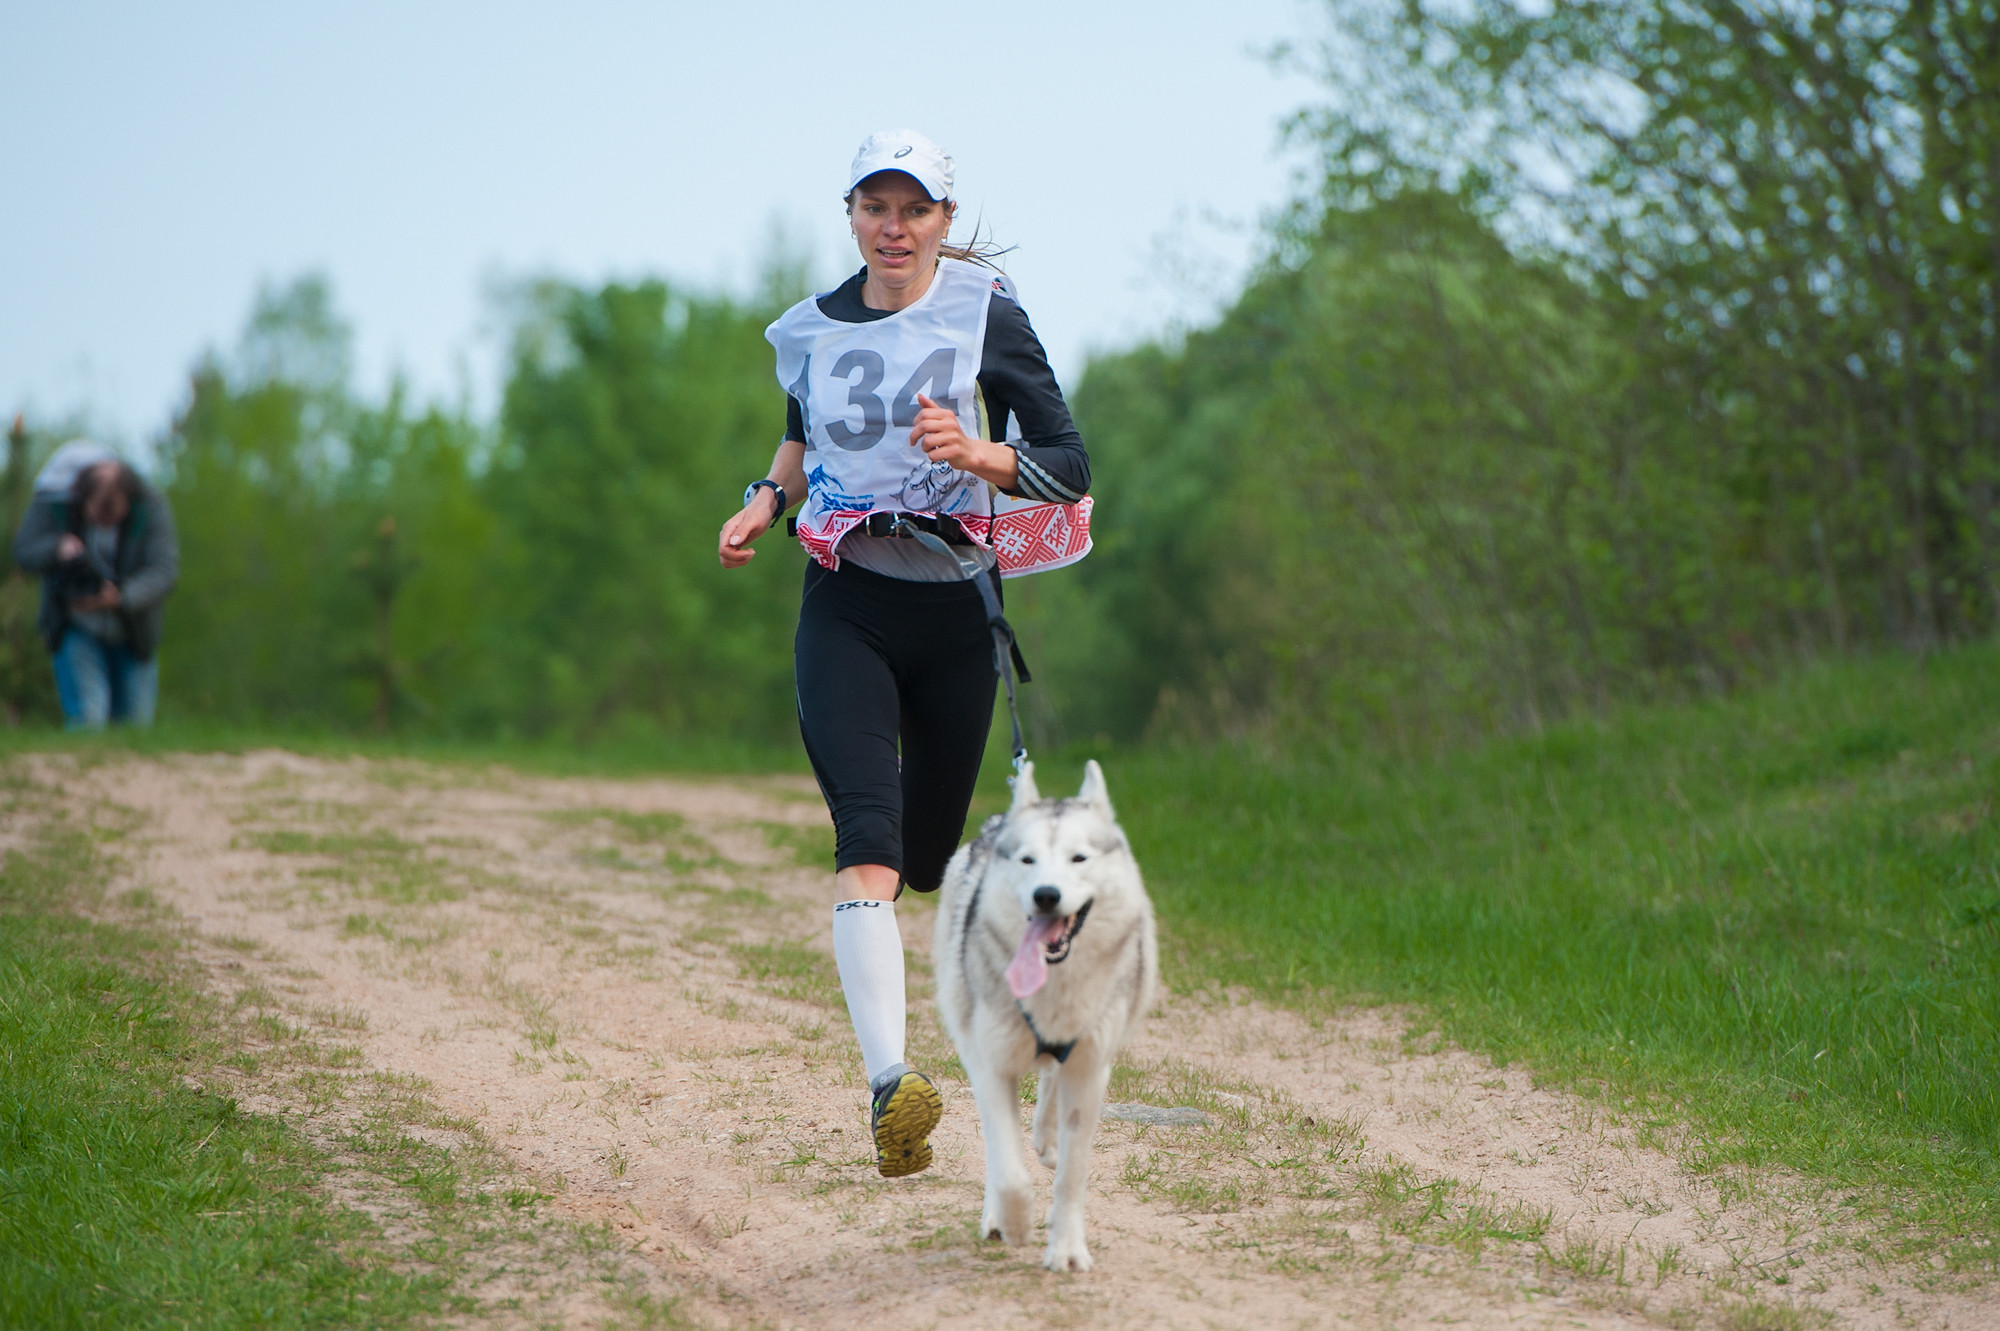 Собачья упряжка на траве: в Беларуси прошел «Весенний Драйленд» (ФОТО)